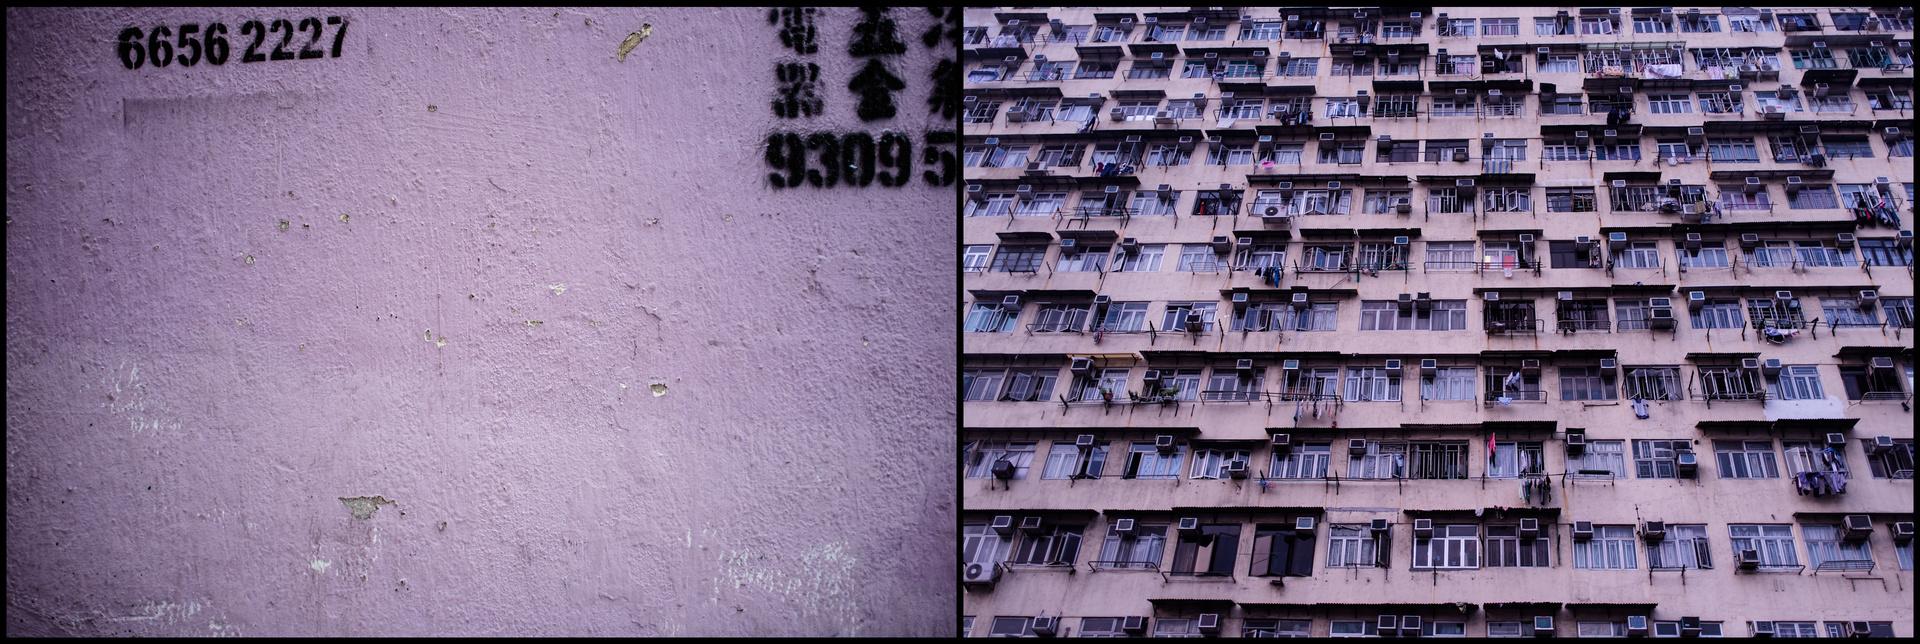 HK_007.jpg